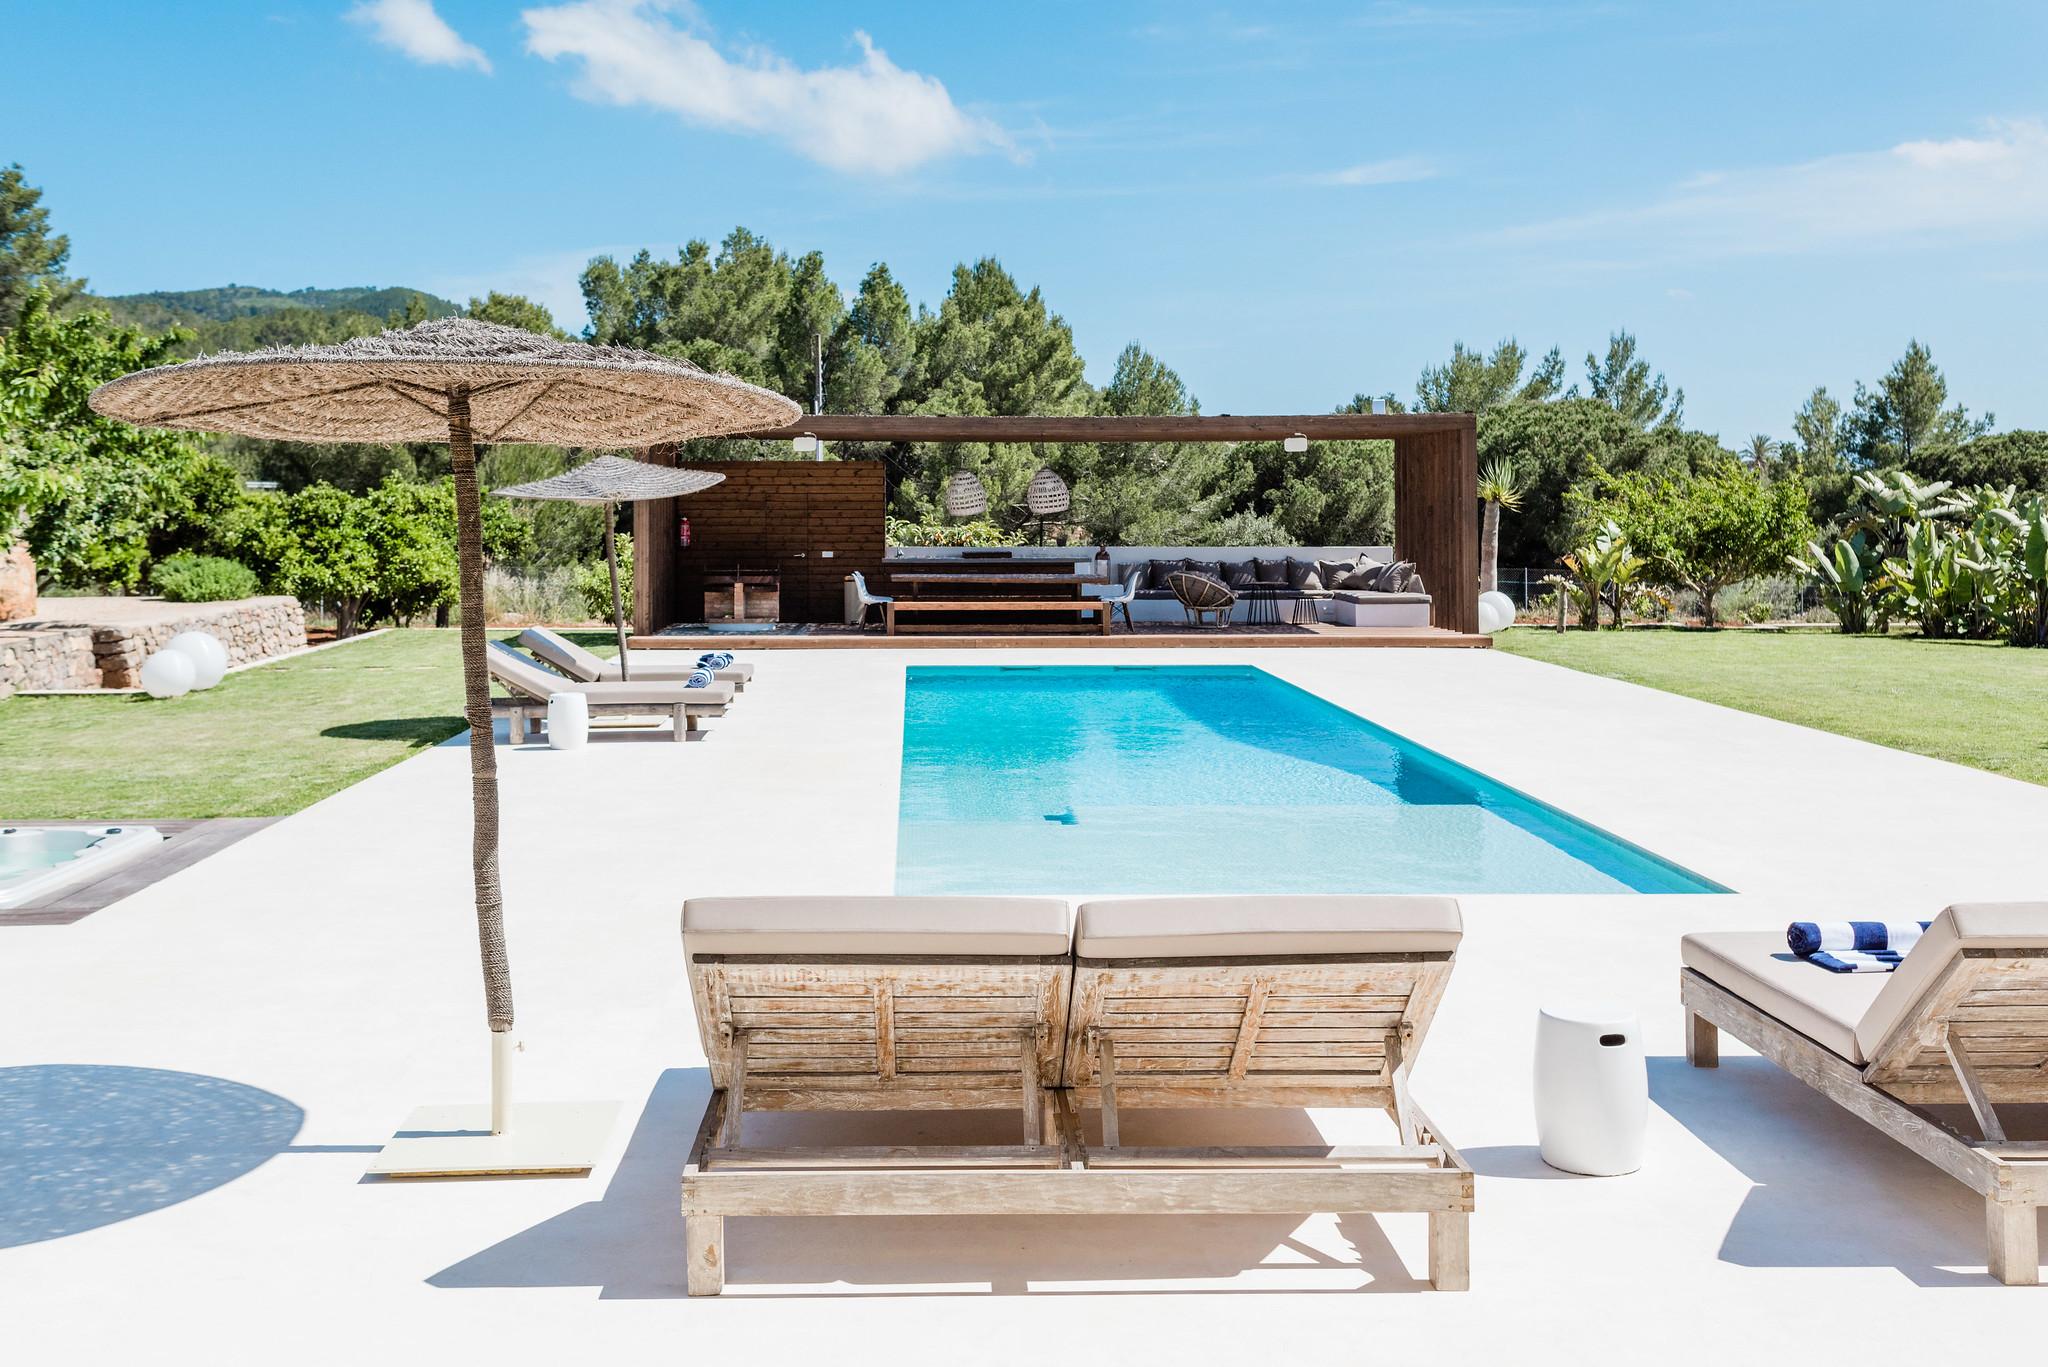 https://www.white-ibiza.com/wp-content/uploads/2020/06/white-ibiza-villas-can-carmen-exterior-from-lounger.jpg